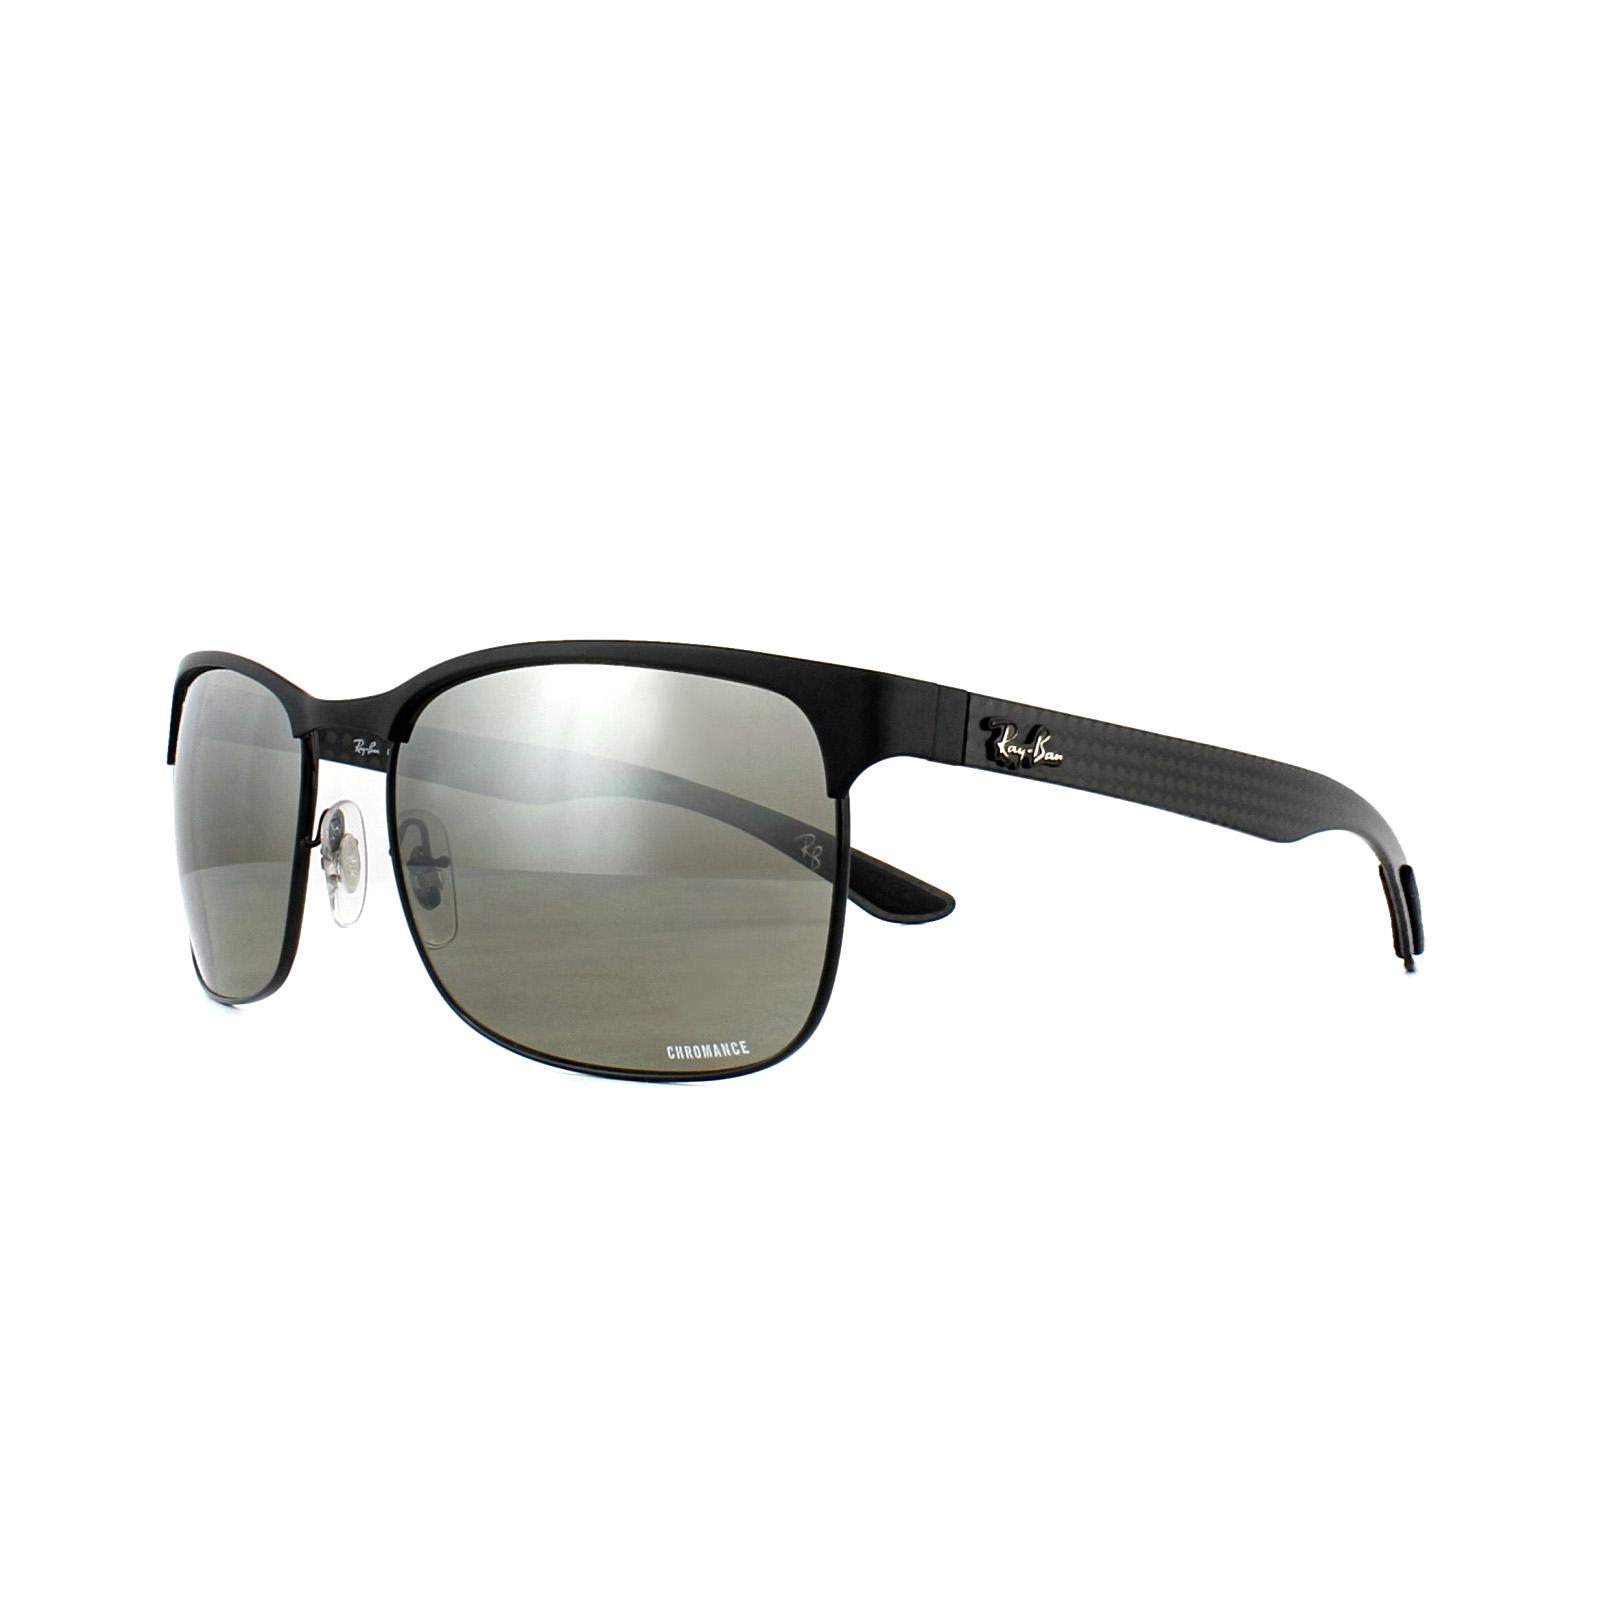 9cda57f687 Sentinel Ray-Ban Sunglasses RB8319CH 186 5J Black Silver Mirror Polarized  Chromance